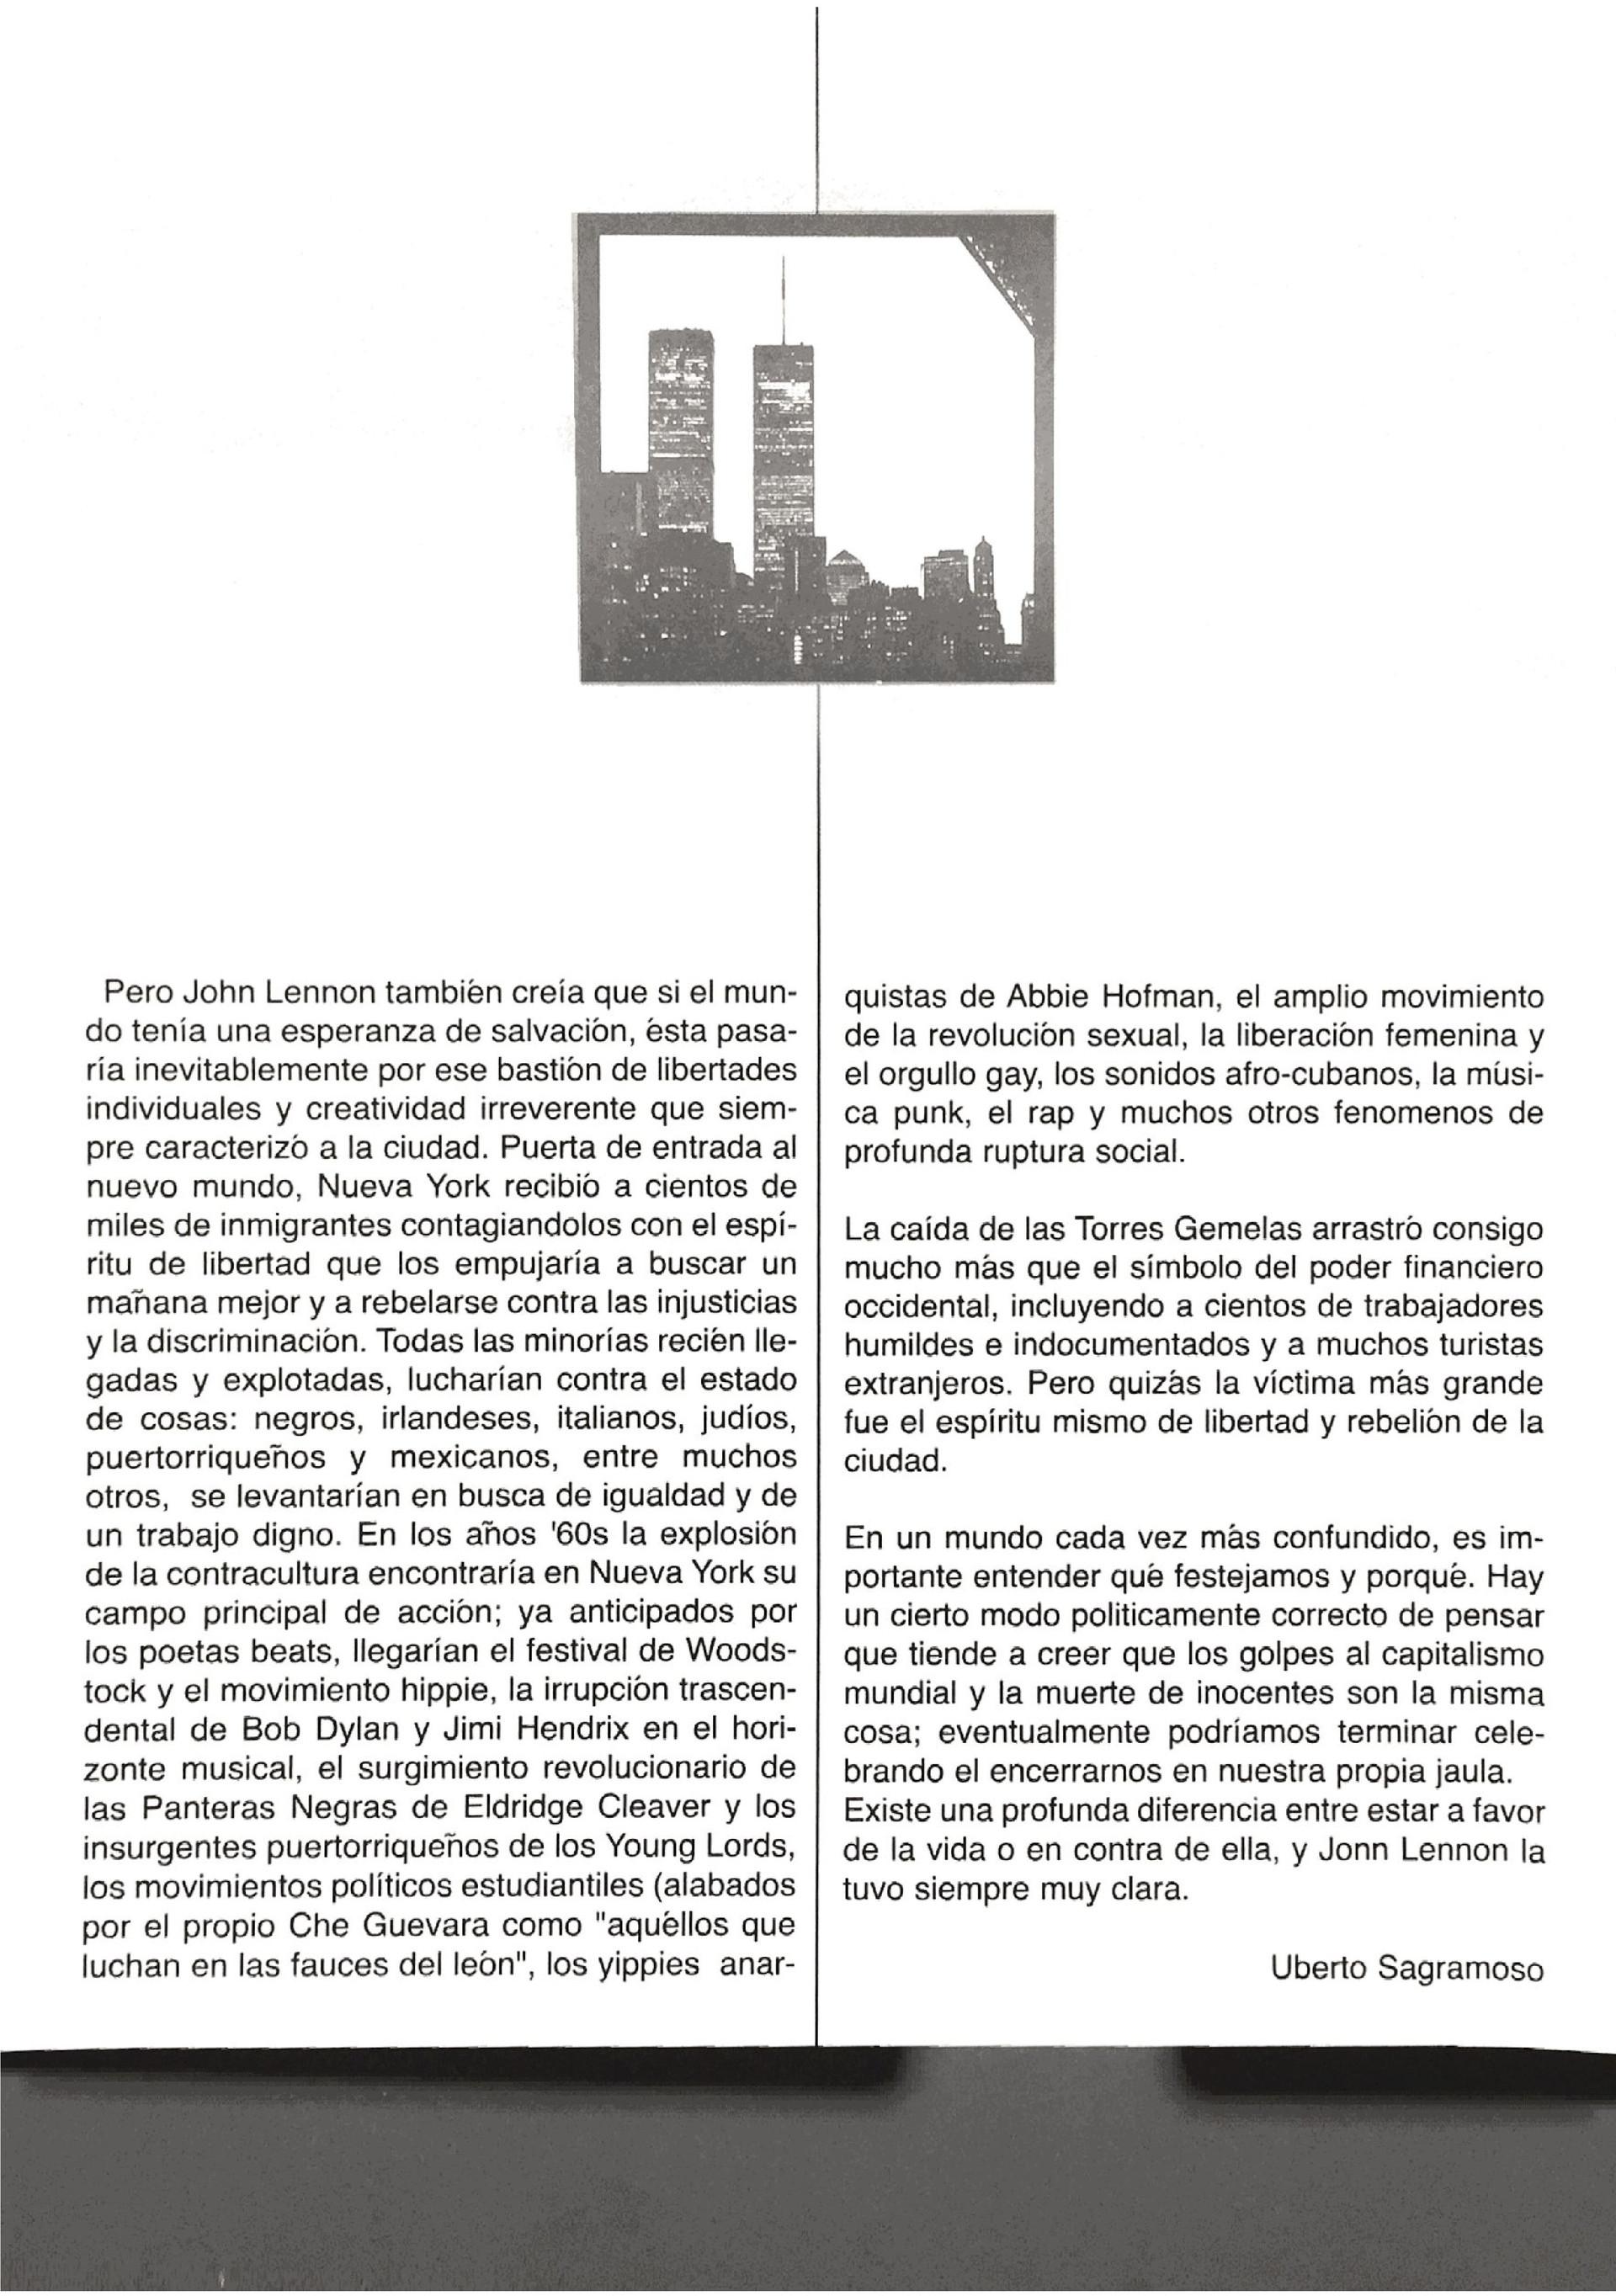 sobre expreso_Page_27.jpeg